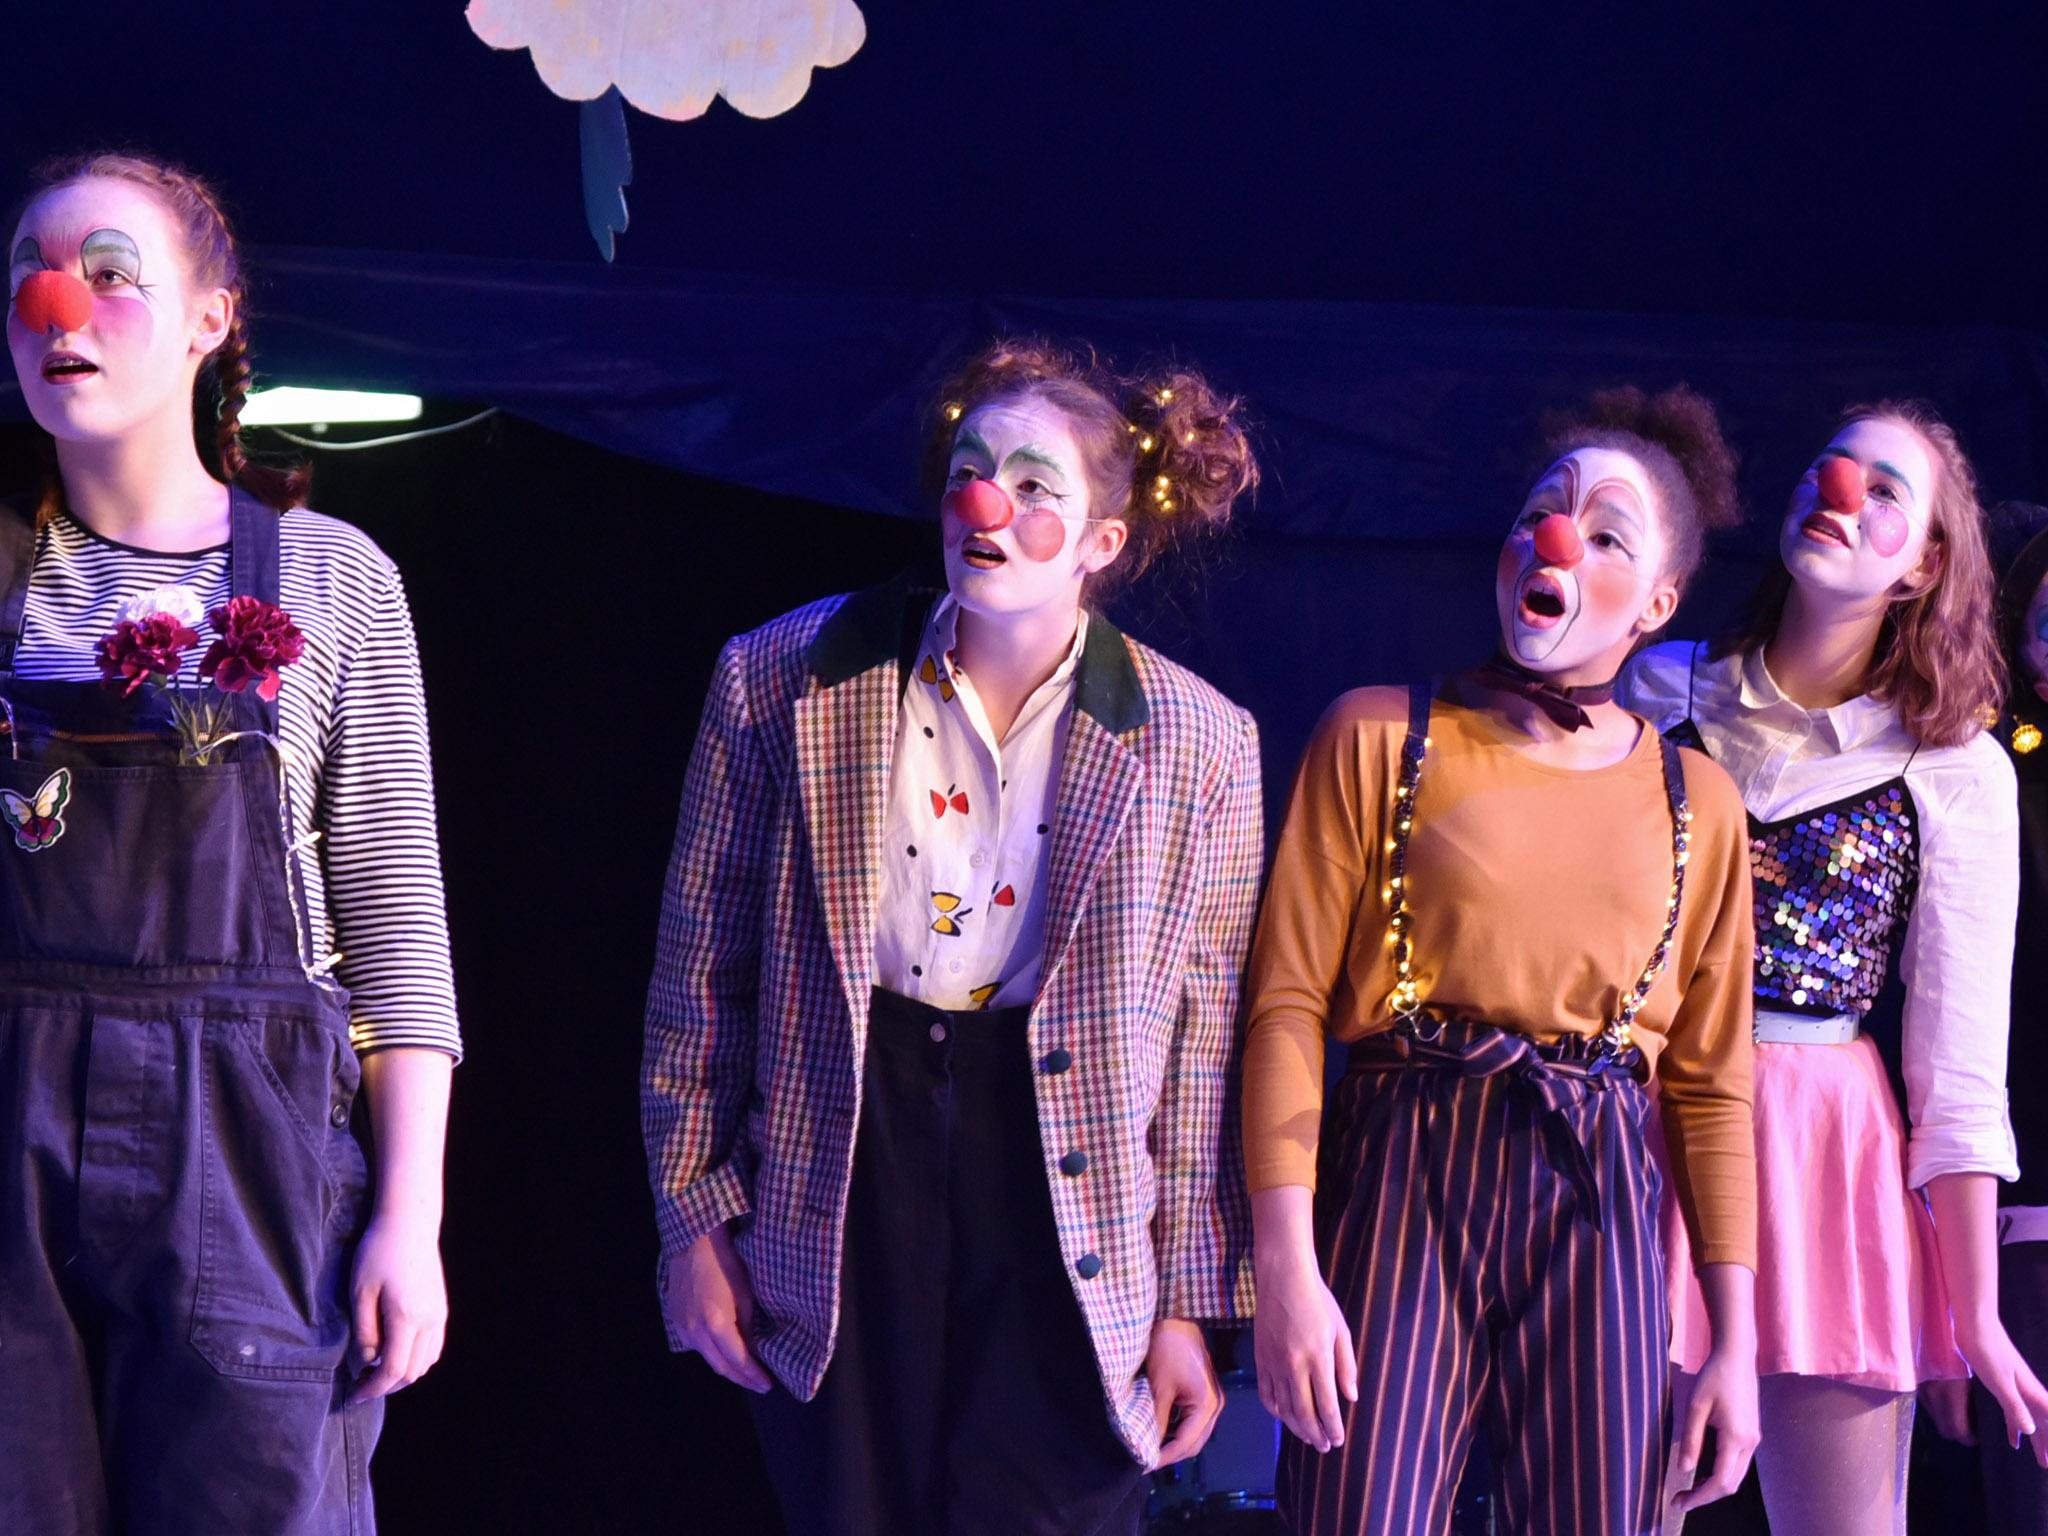 Jonglieren, Akrobatik oder Clownerie - das Angebot des Circus Kirps ist groß. Foto: Michael Braun.